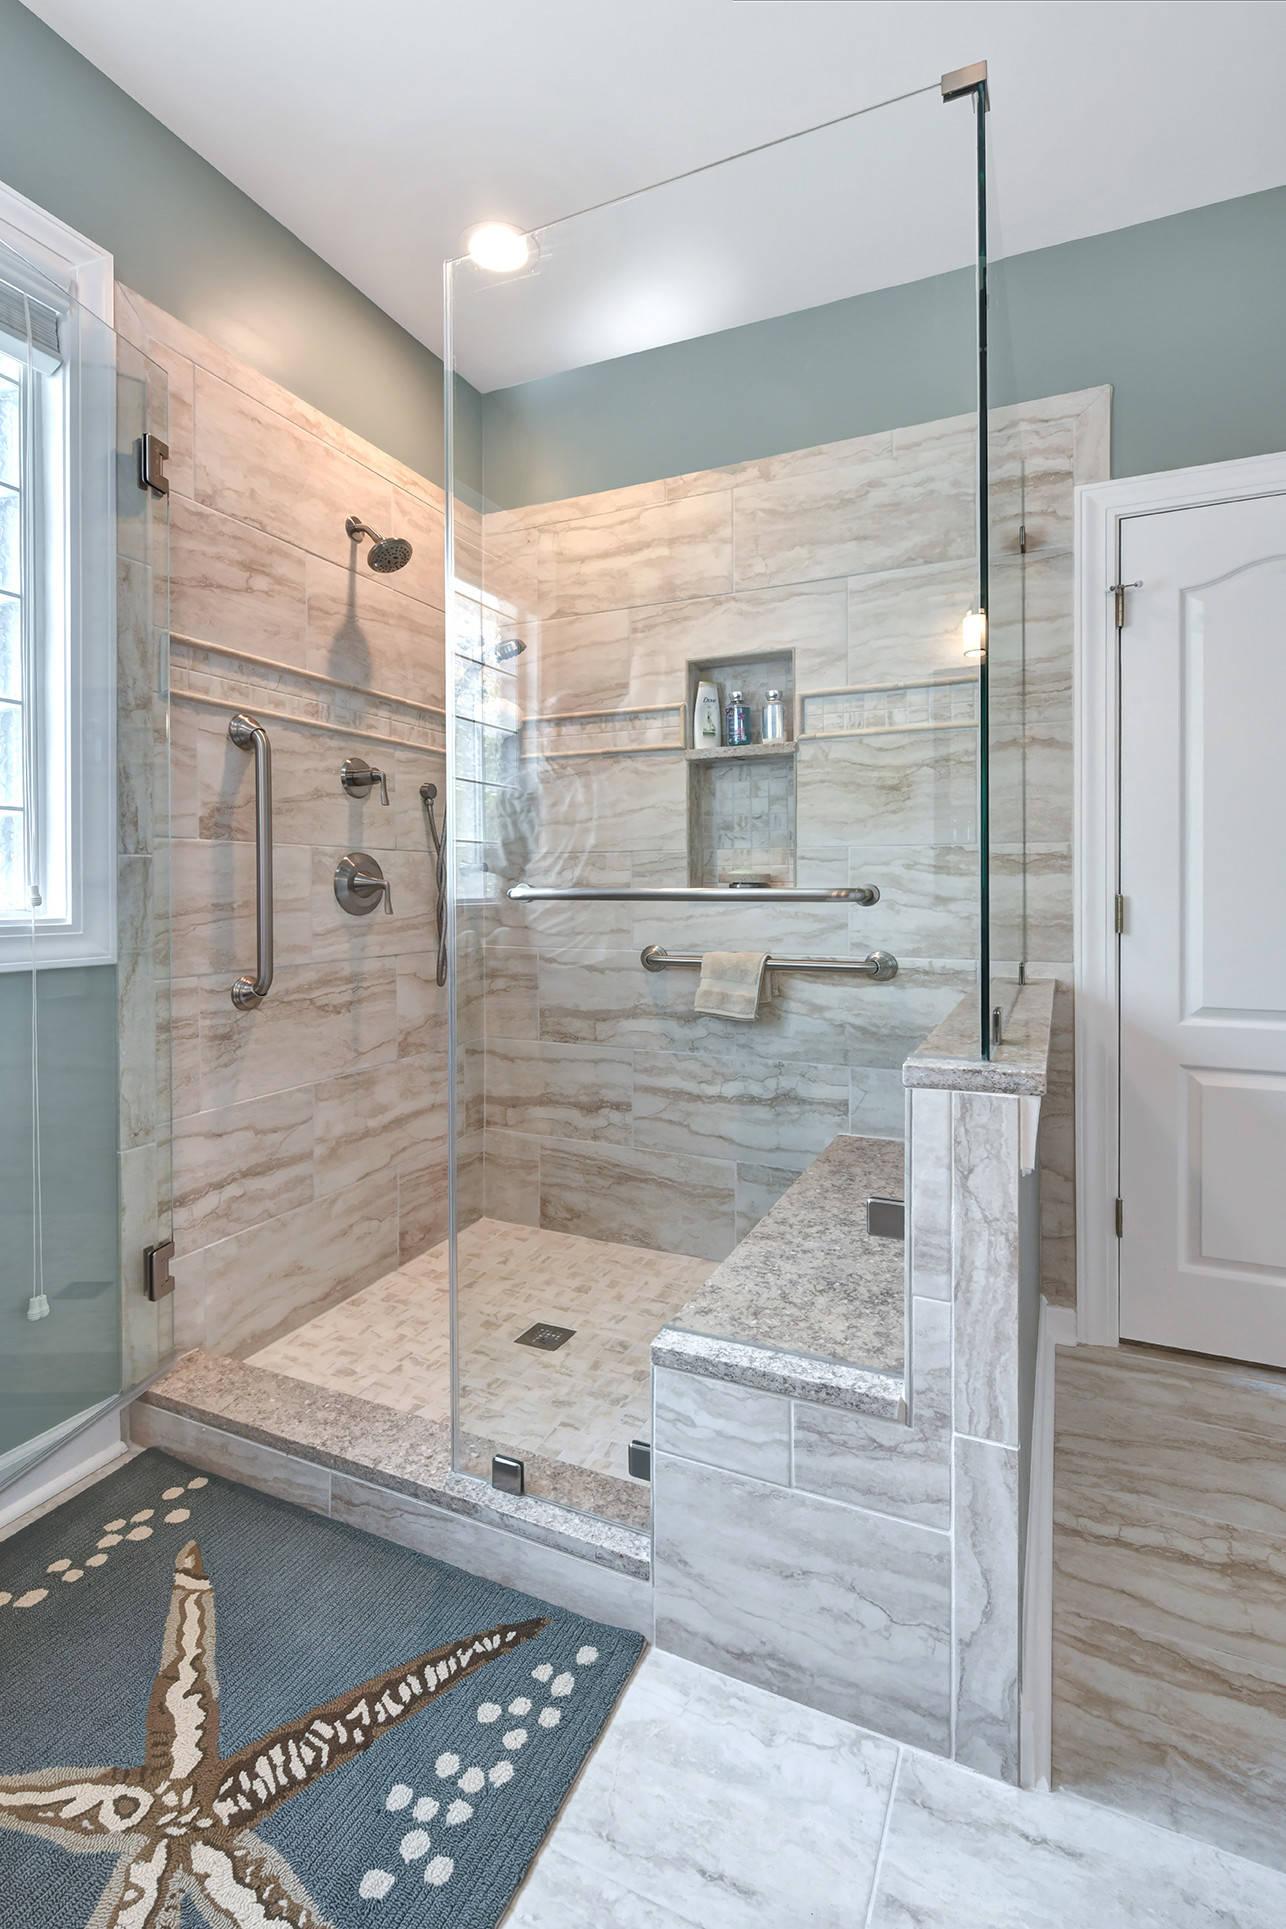 75 Beautiful Coastal Bathroom Pictures & Ideas - January, 2021   Houzz